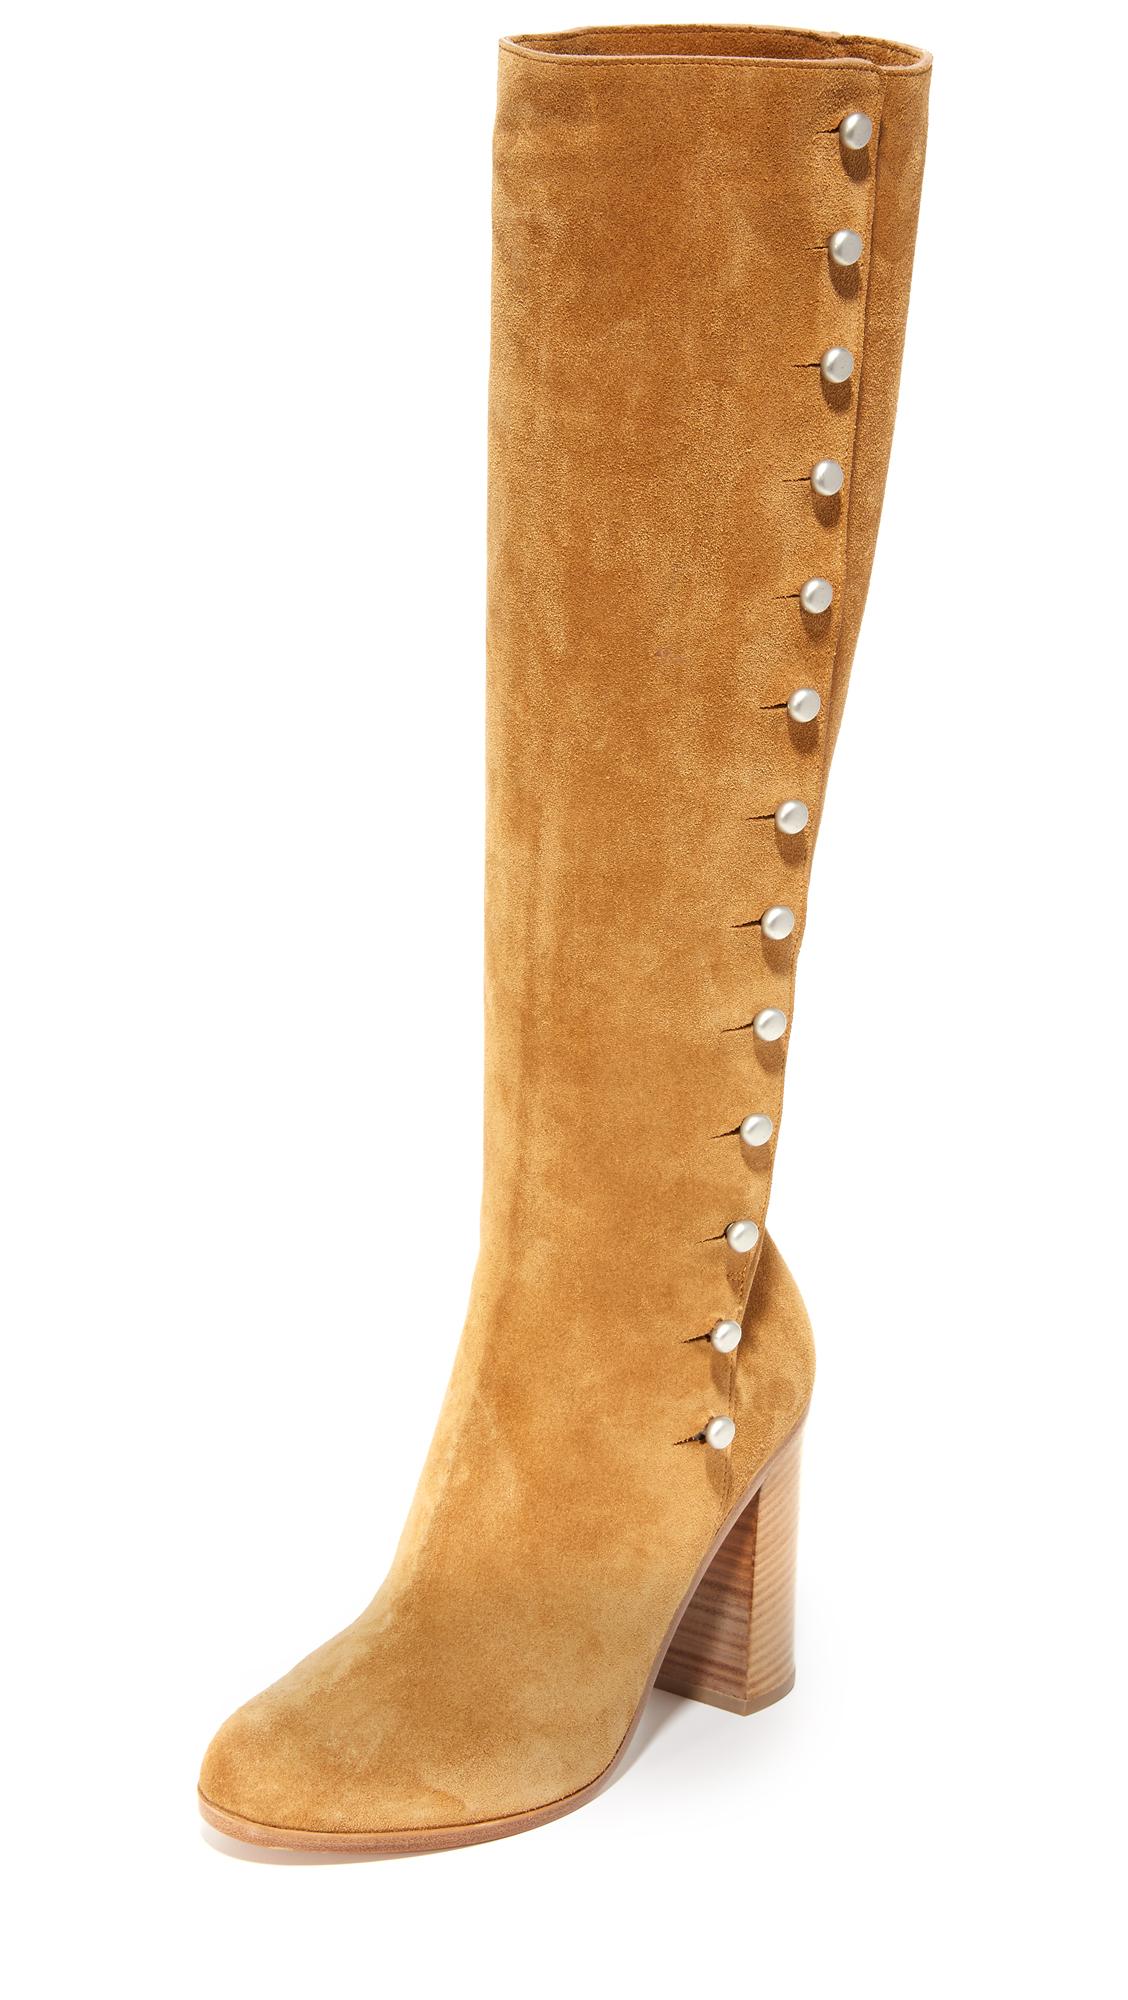 Maison Margiela Suede Boots - Brown